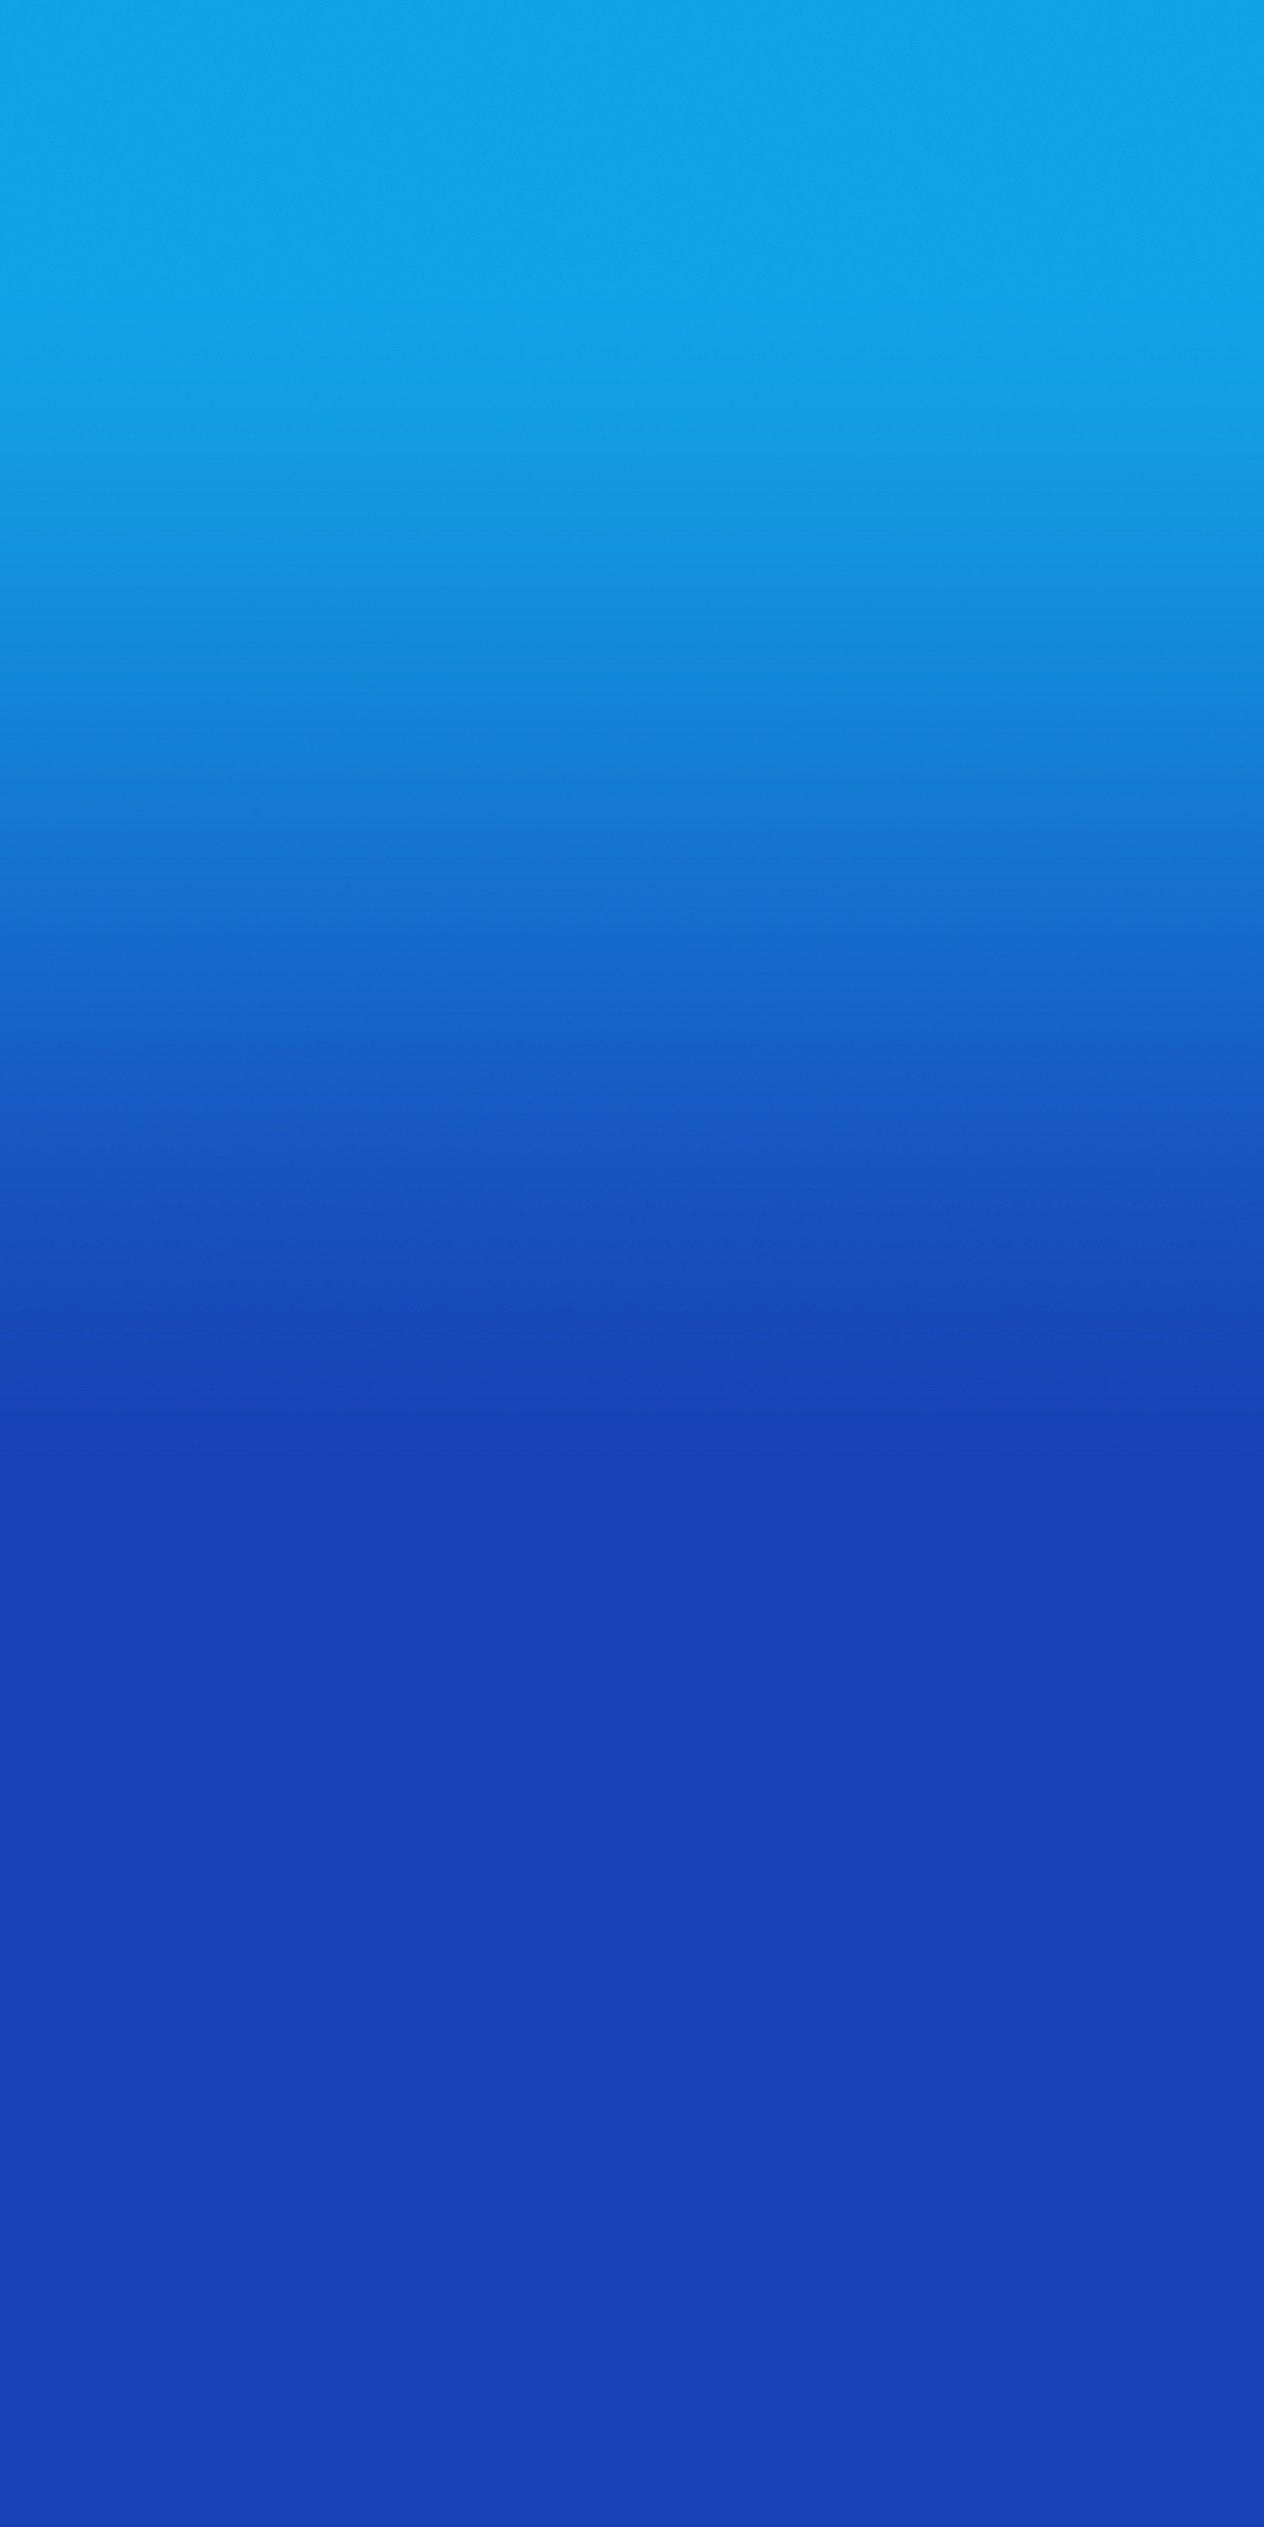 200 Wallpaper Anime Asus Zenfone Max Pro M1 HD Terbaru